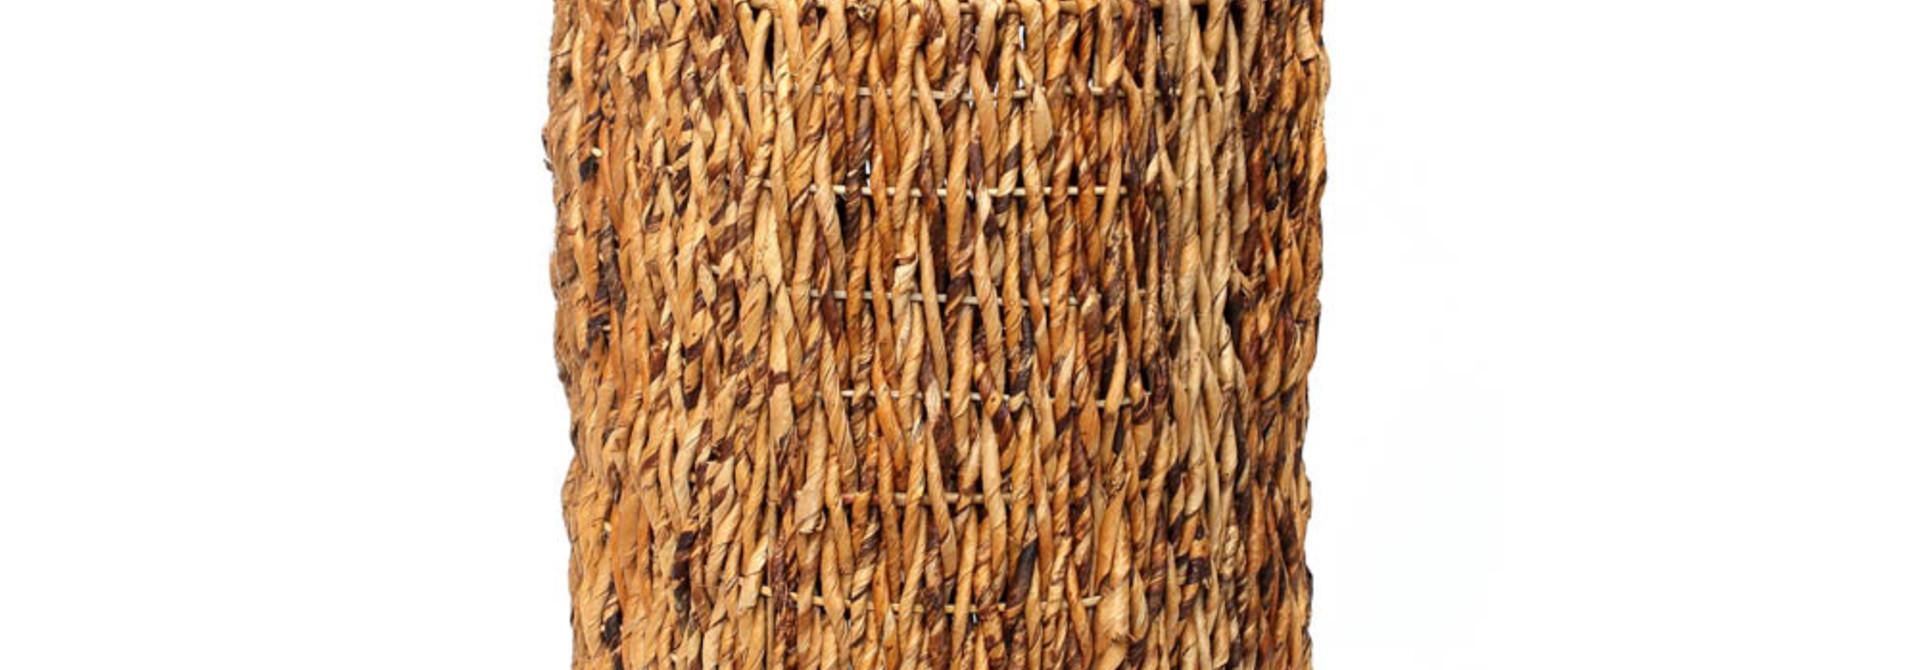 Wasmand - Riet - Banana - M - 37 x 37 x 44 cm